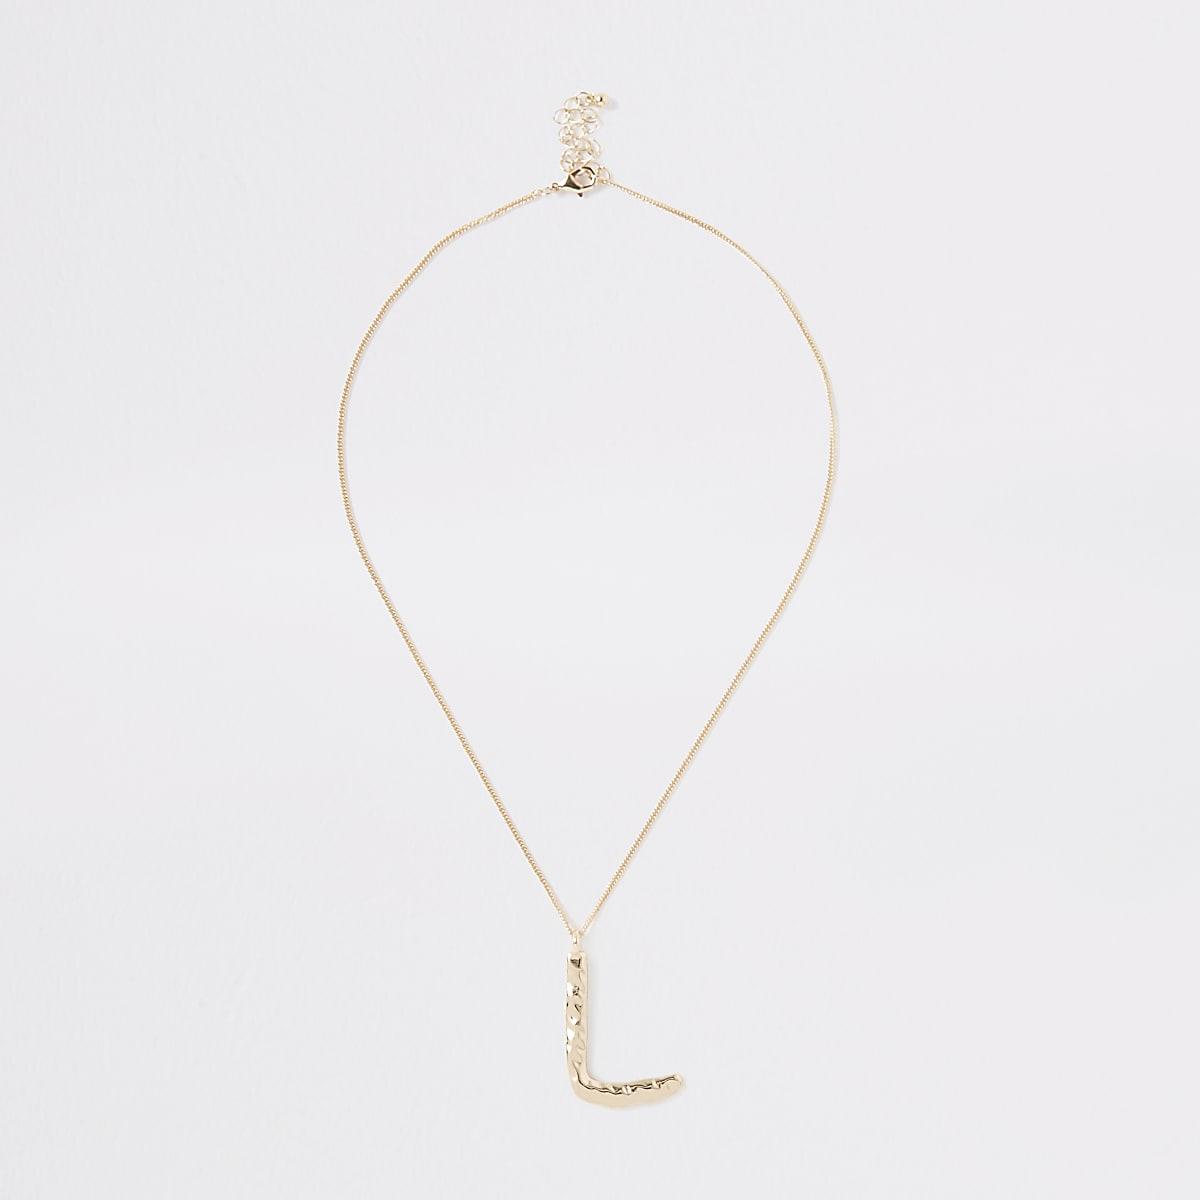 Gold color large initial 'L' necklace